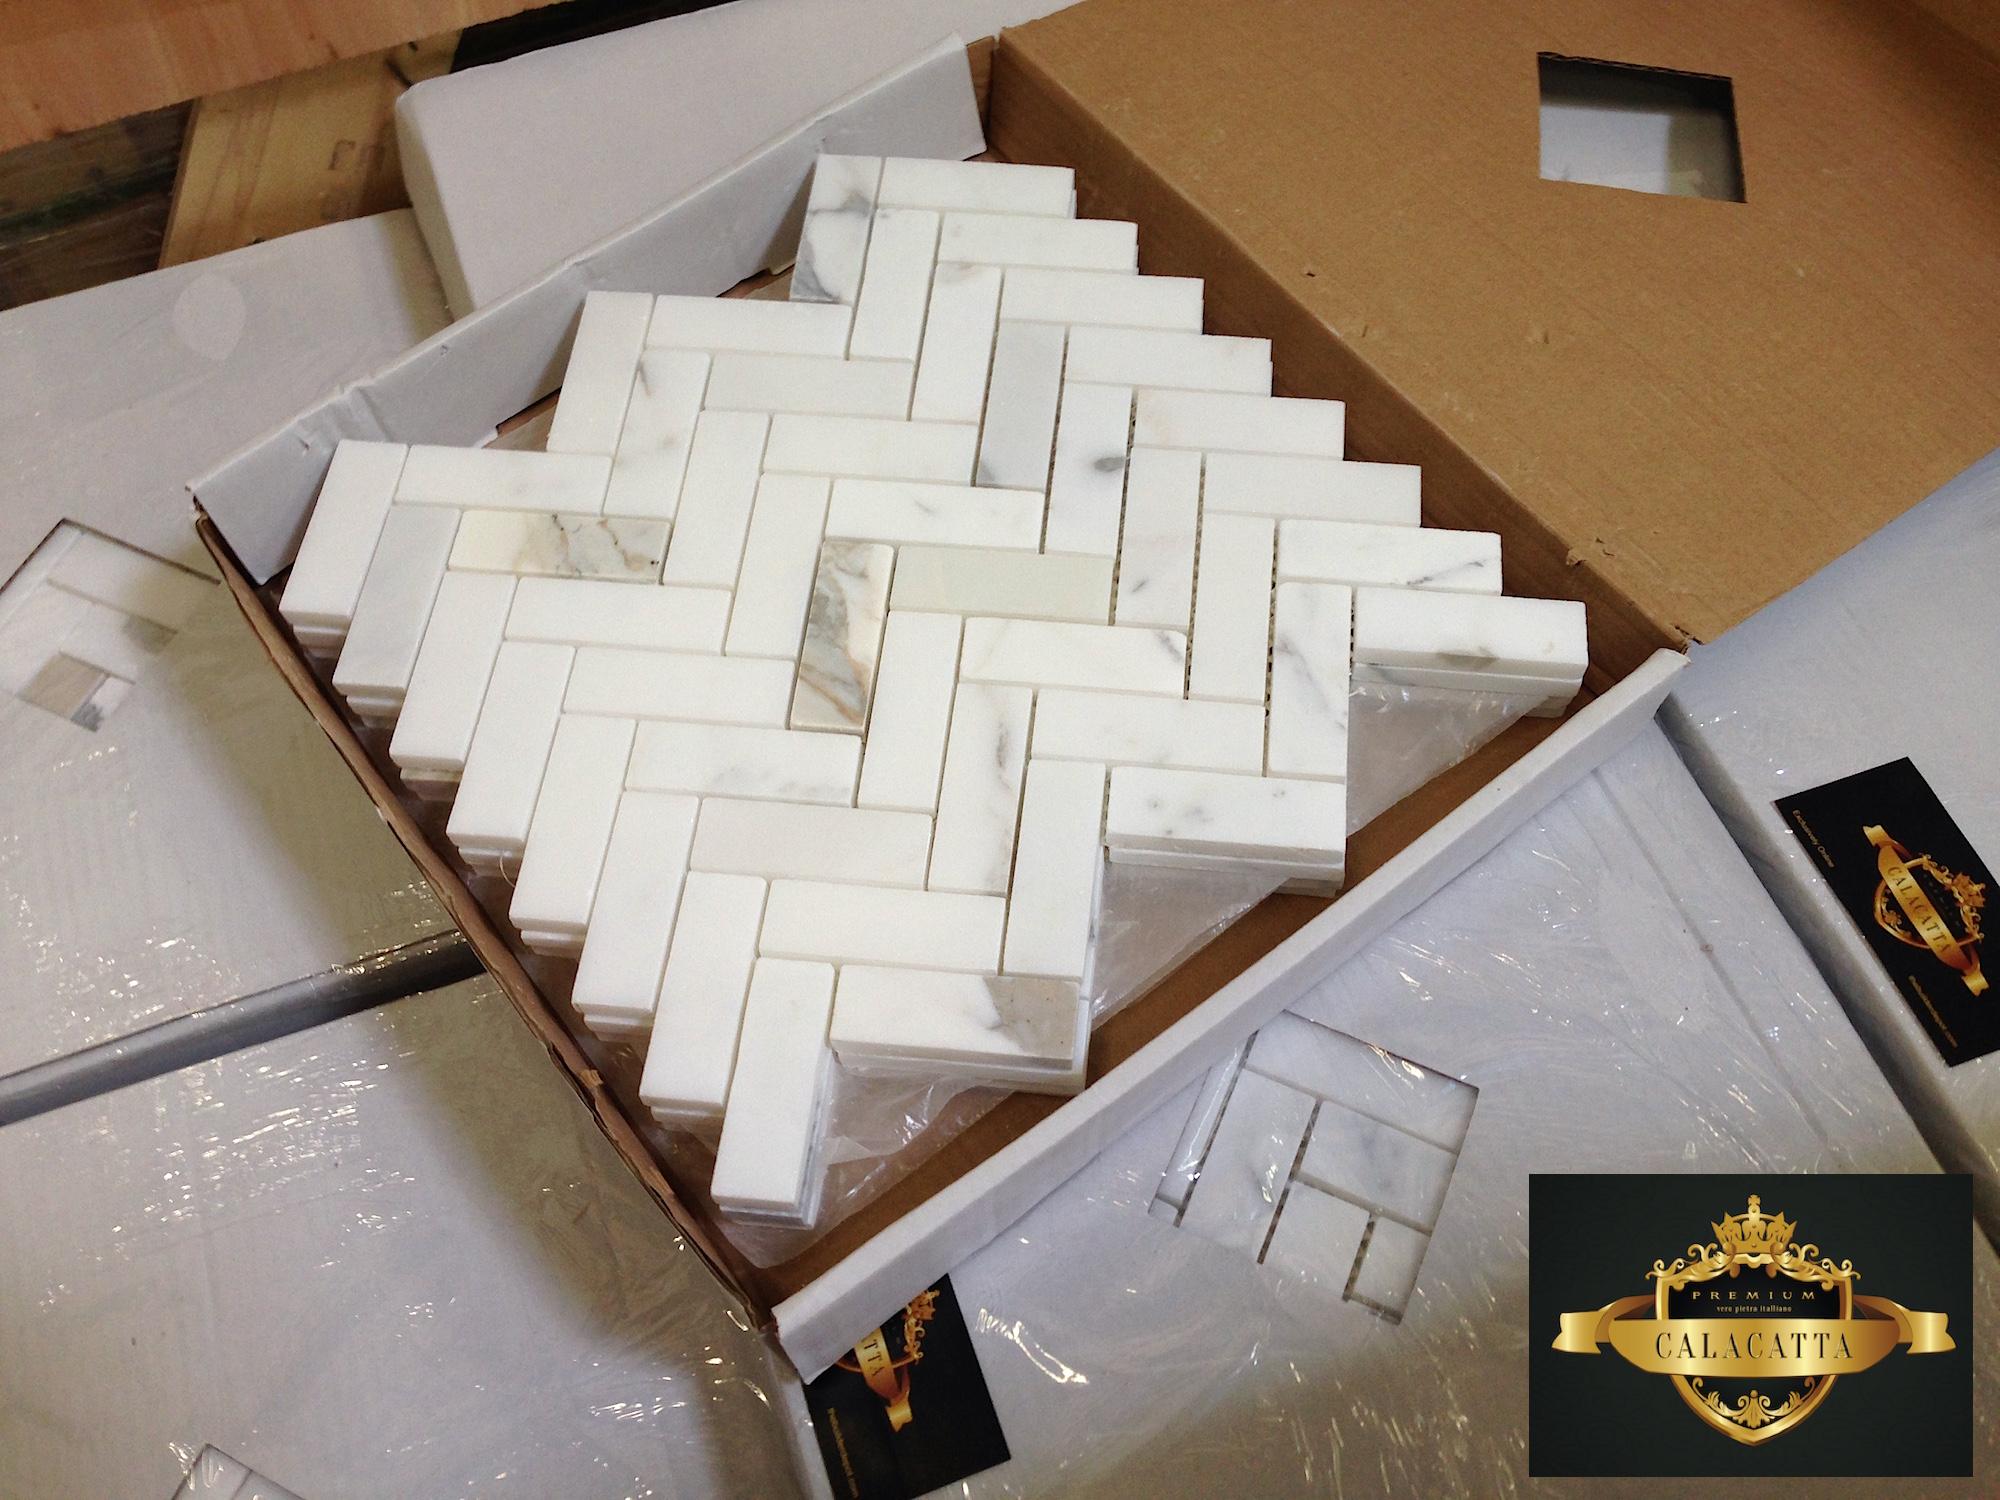 Calacatta 1×3″ Herringbone Honed Mosaic Tile and Free Shipping ...